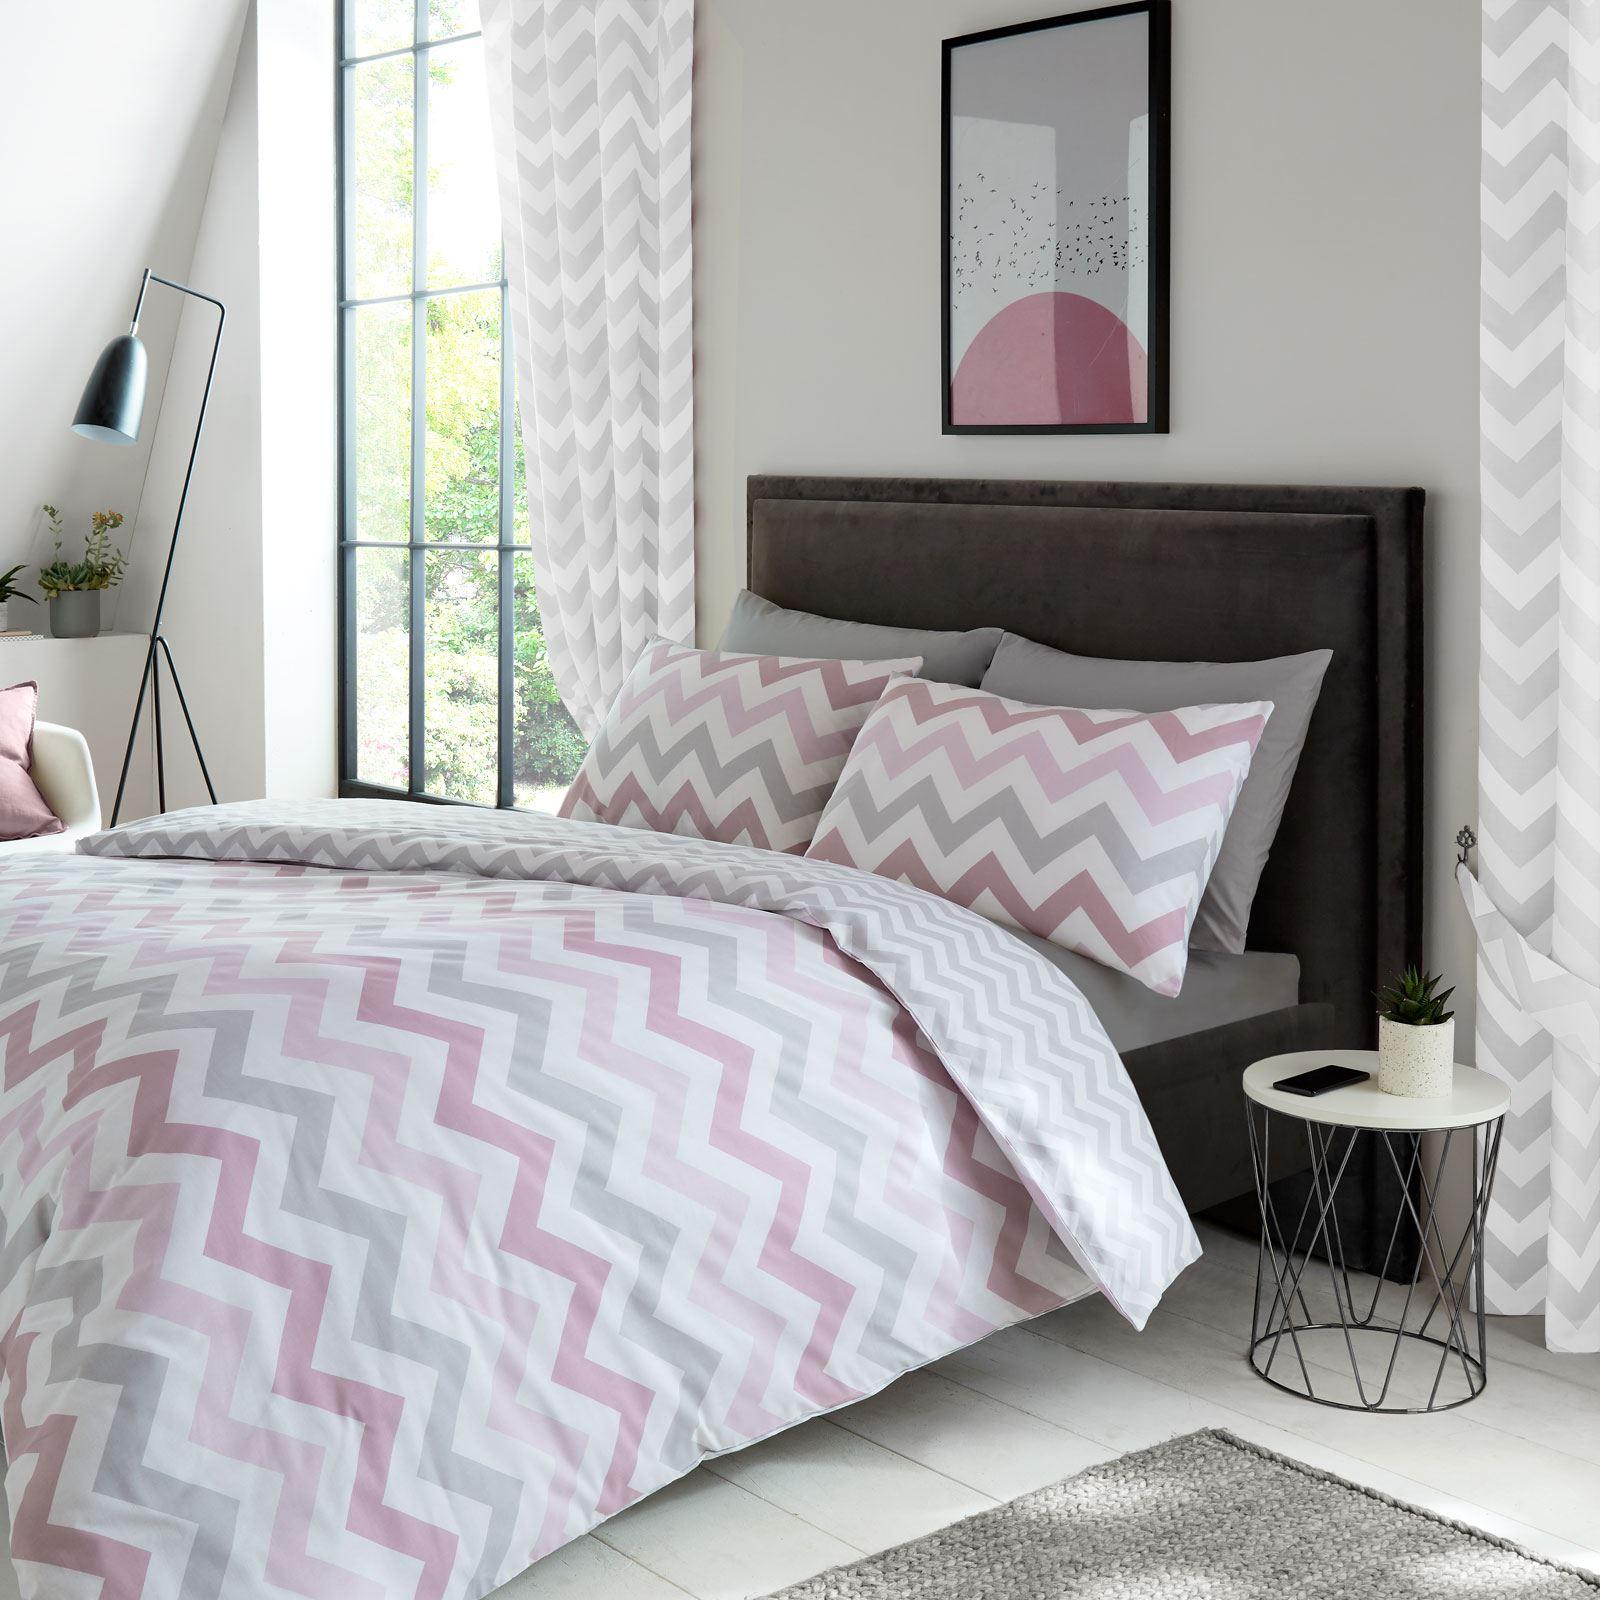 Metro Geometric Chevron Grey White Lined Curtains Bedroom